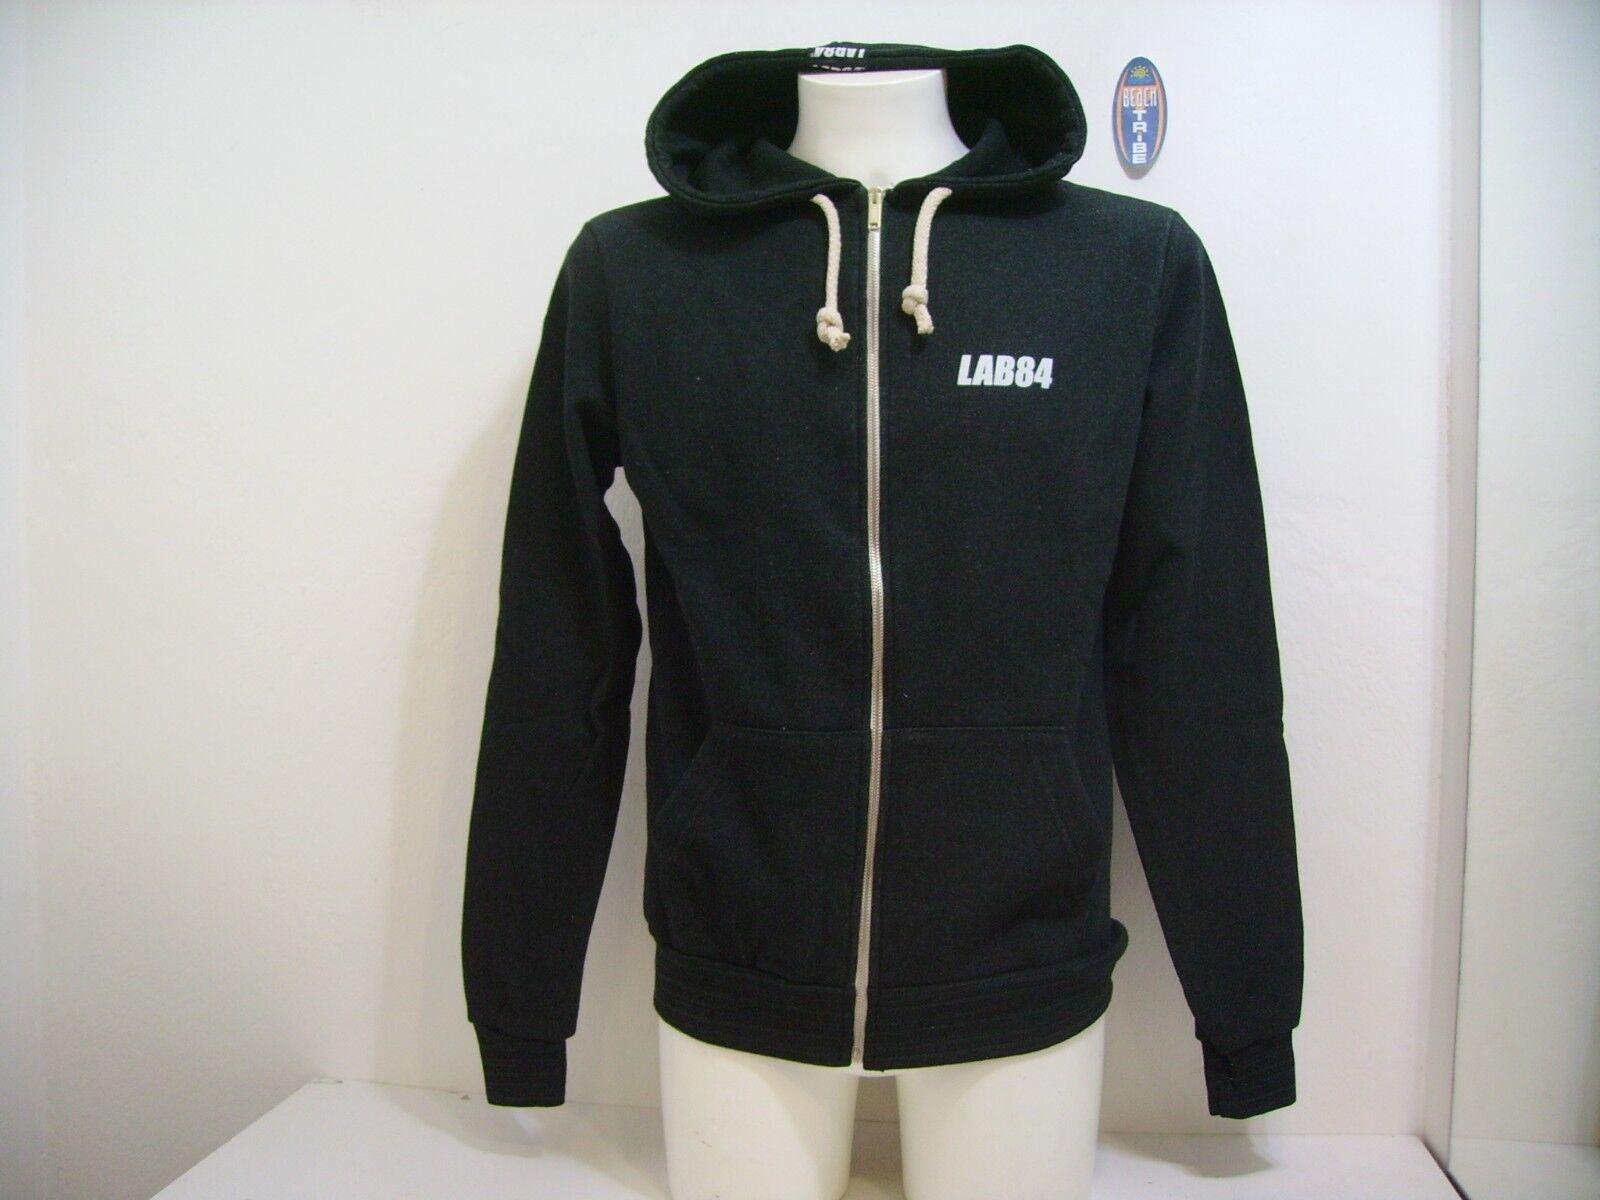 Lab84 Männer Pullover Abzugshaube geöffnet Winter F8 FLPM0324 grün Gr. S